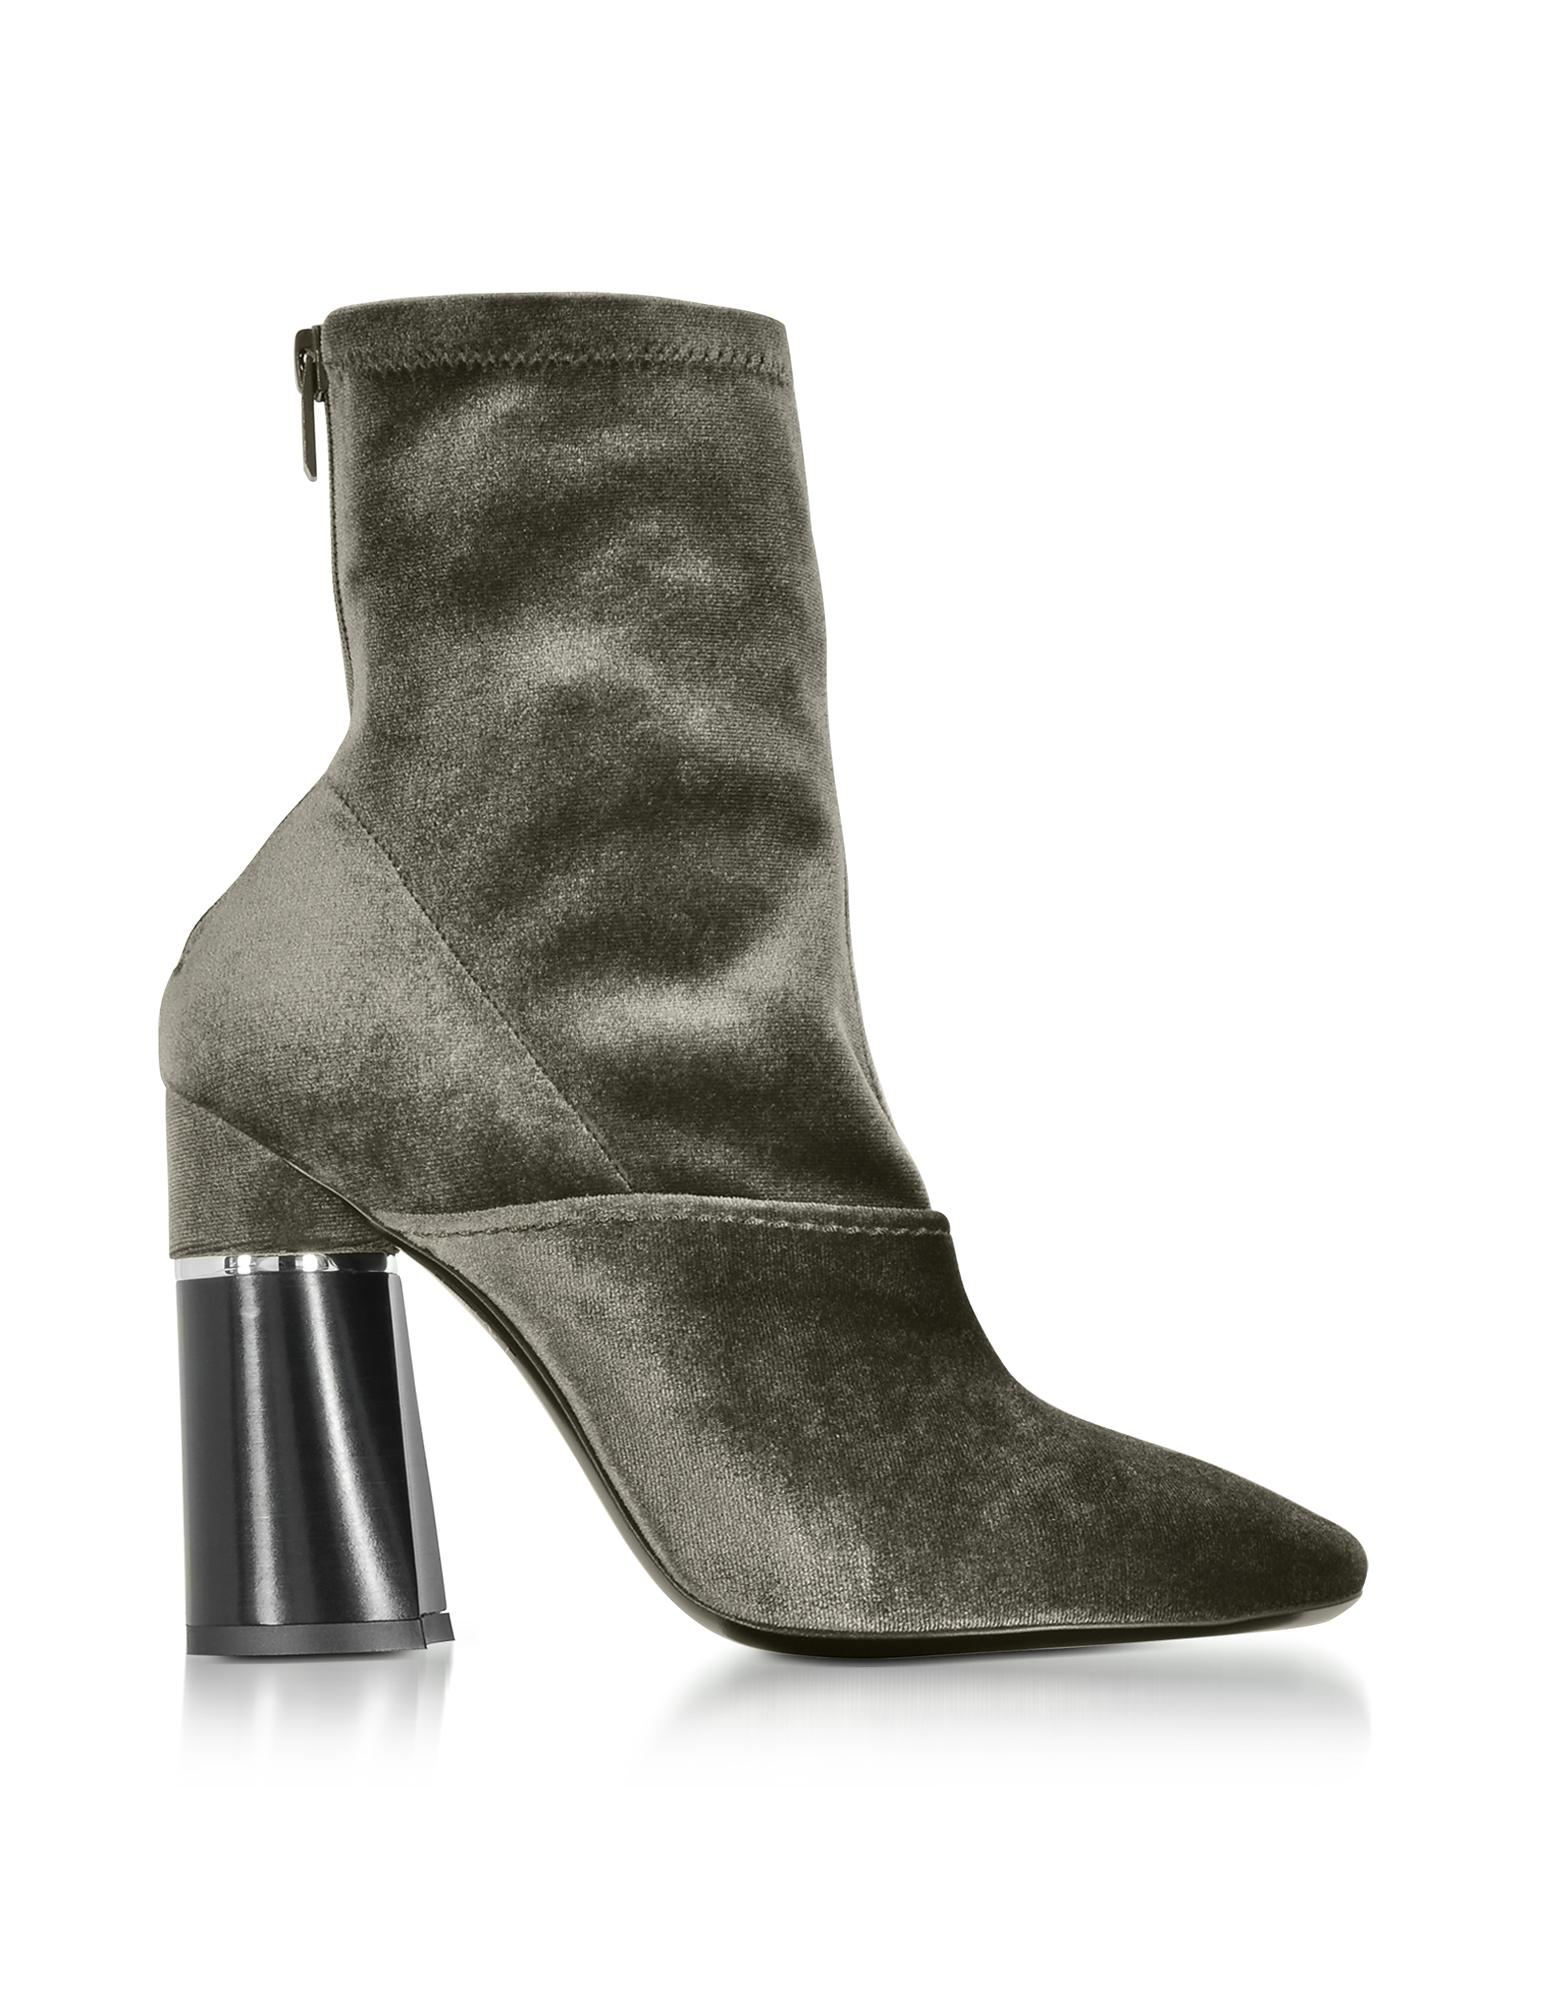 3.1 Phillip Lim Designer Shoes, Kyoto Blush Velvet Stretch High Heel Ankle Boots